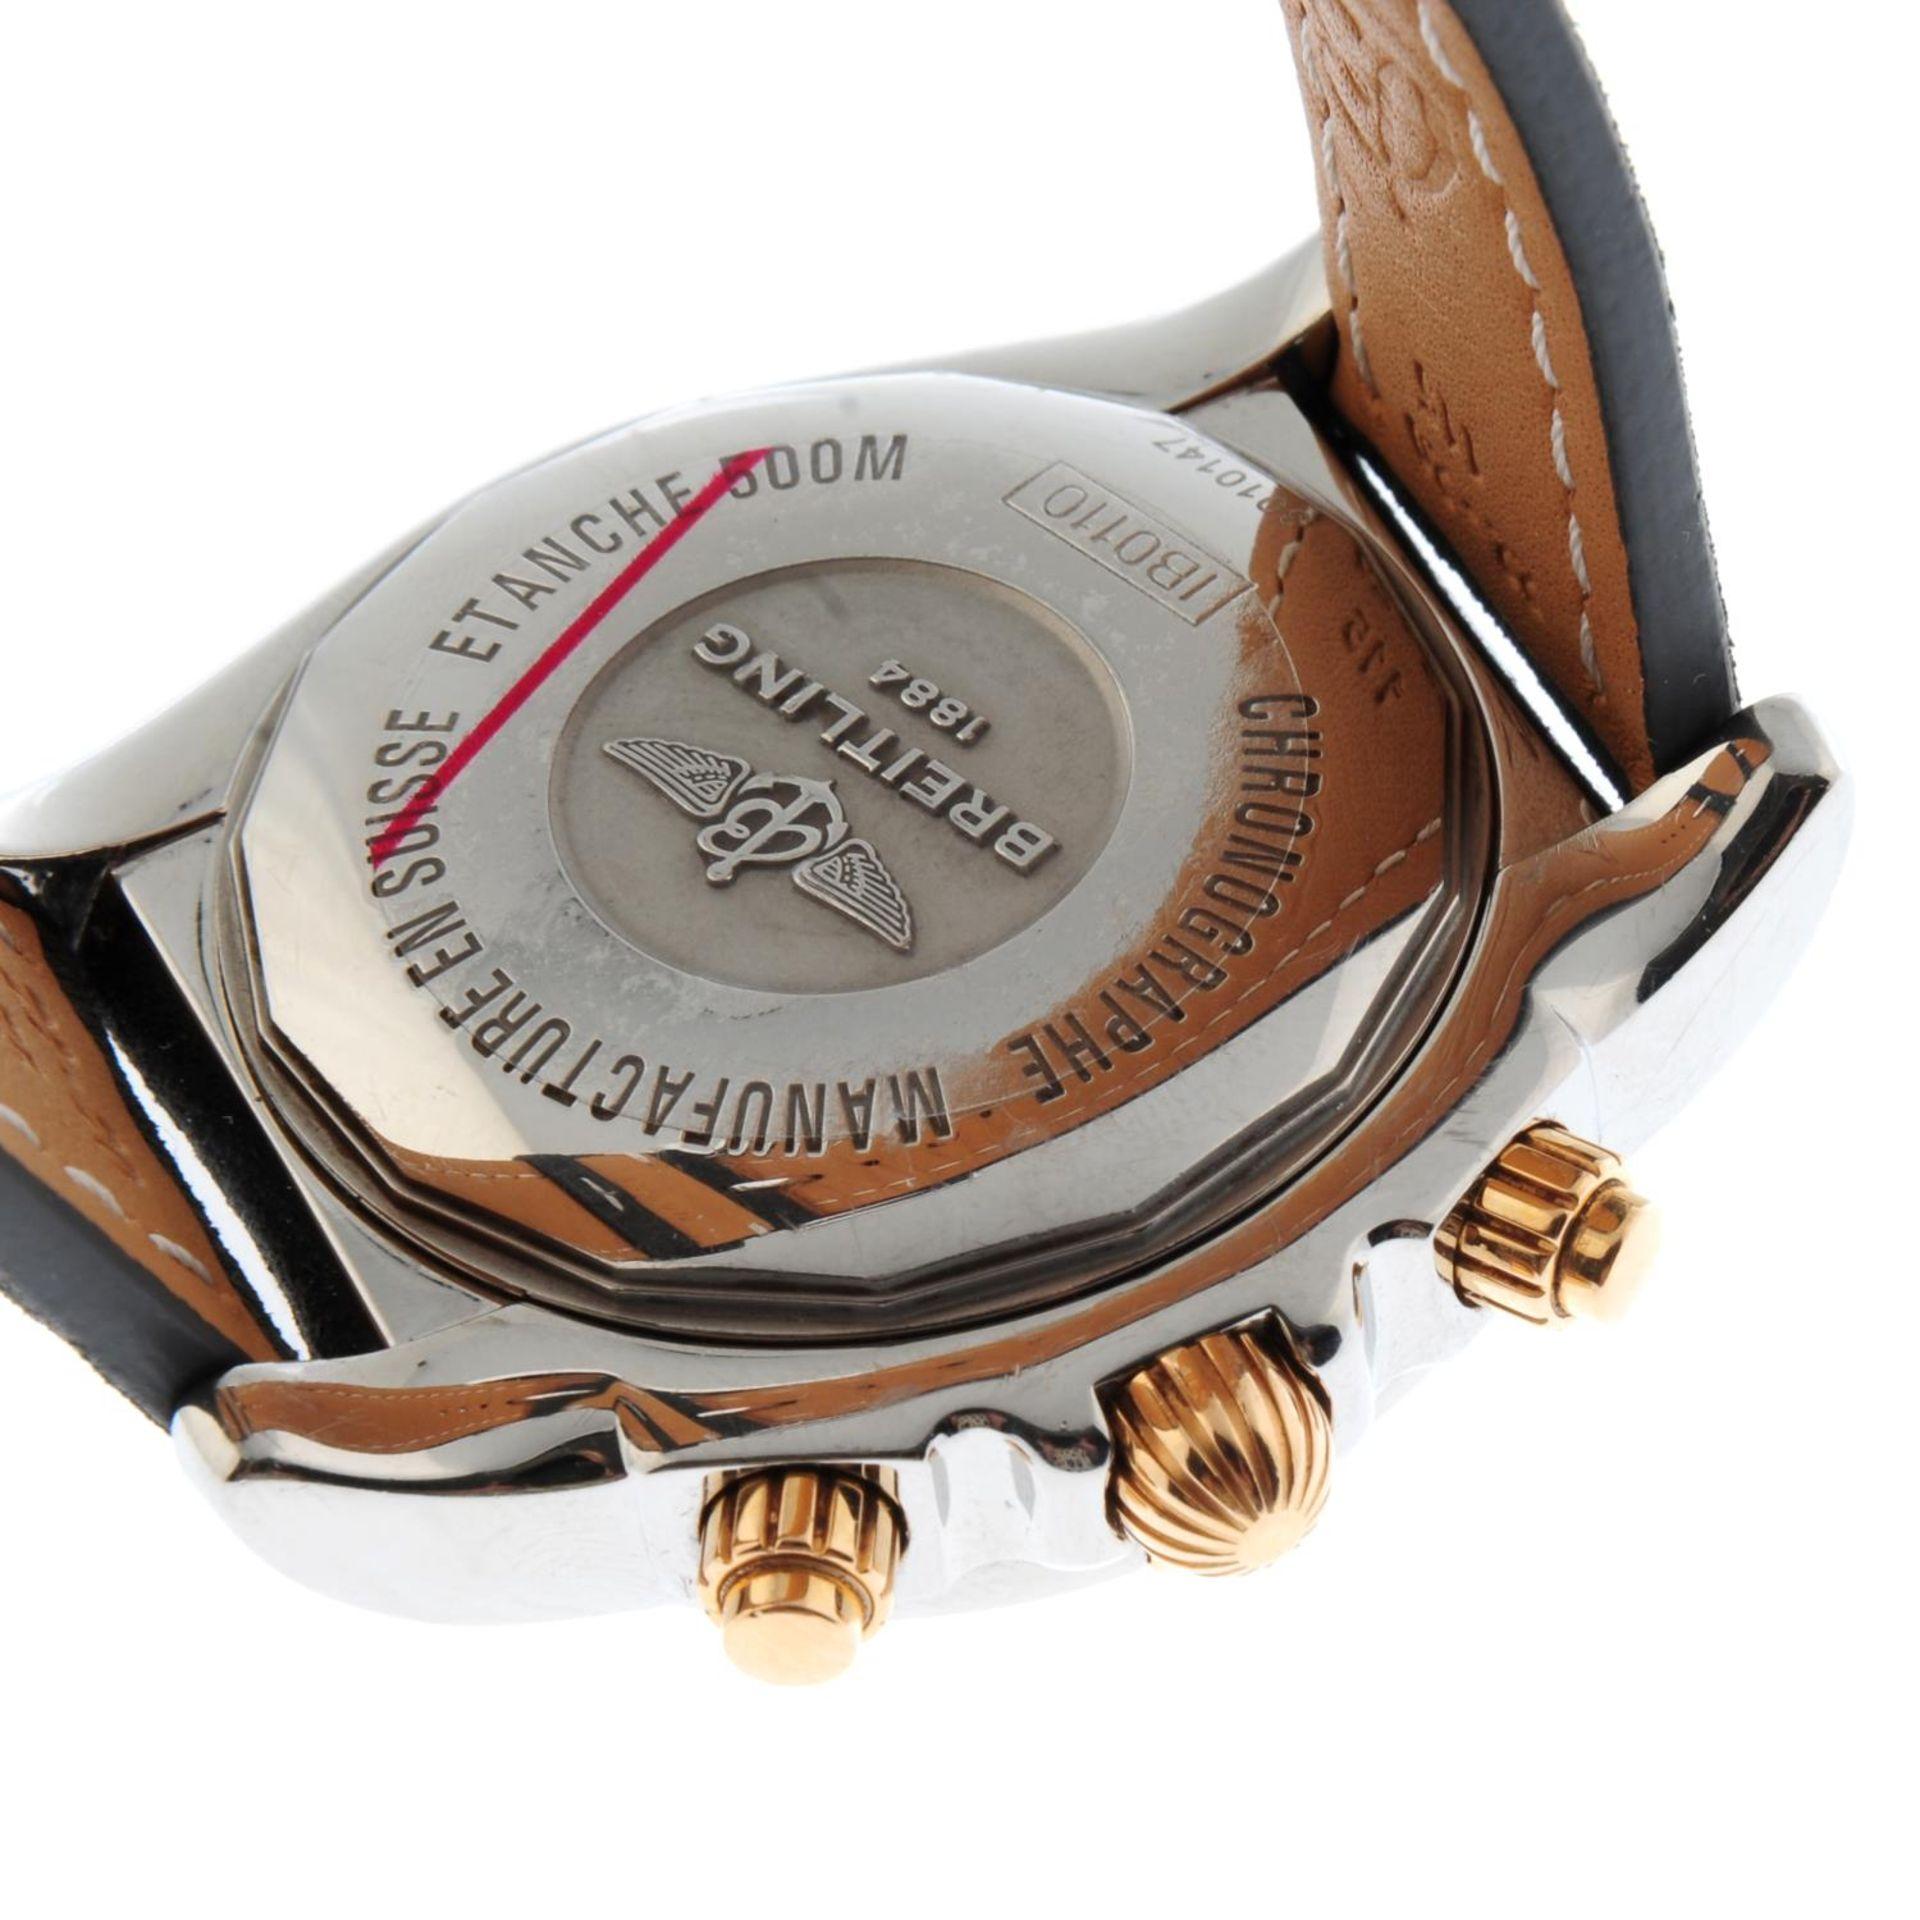 BREITLING - a Chronomat 44 chronograph wrist watch. - Bild 2 aus 5